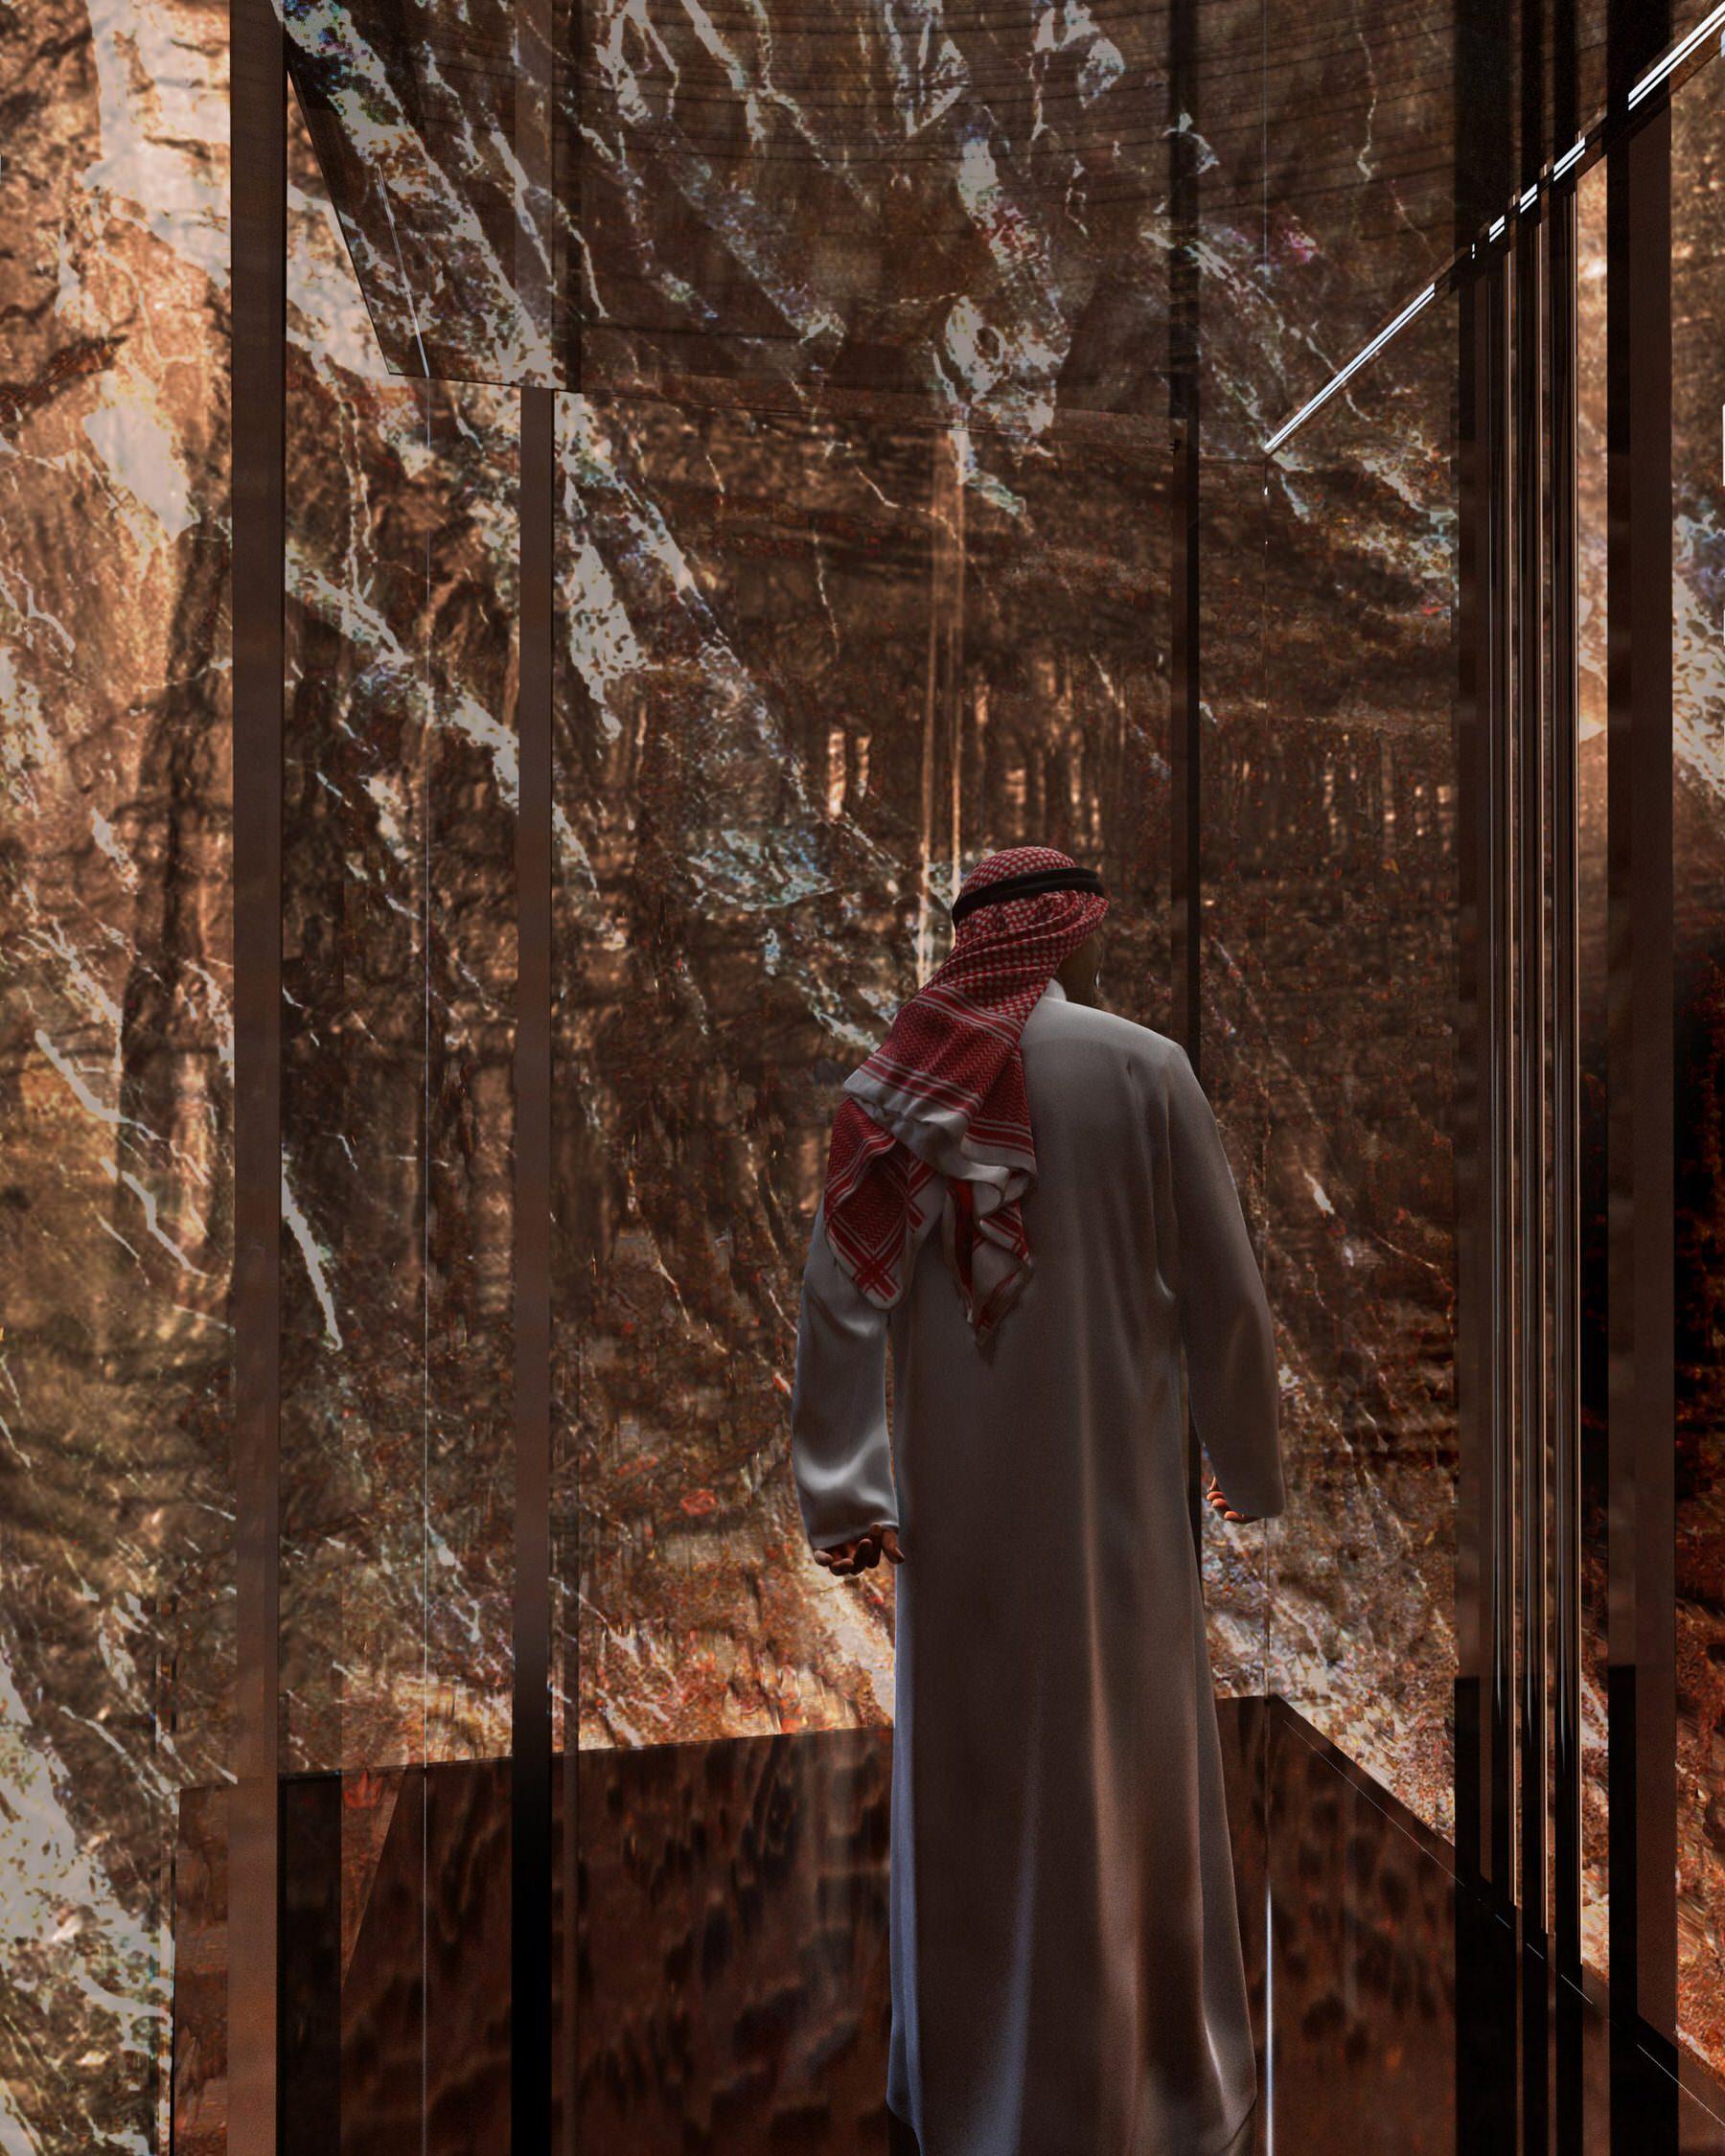 Jean Nouvel, Sharaan Resort Concept, Al 'Ulá, Saudi Arabia, Rock Buildings | Yellowtrace